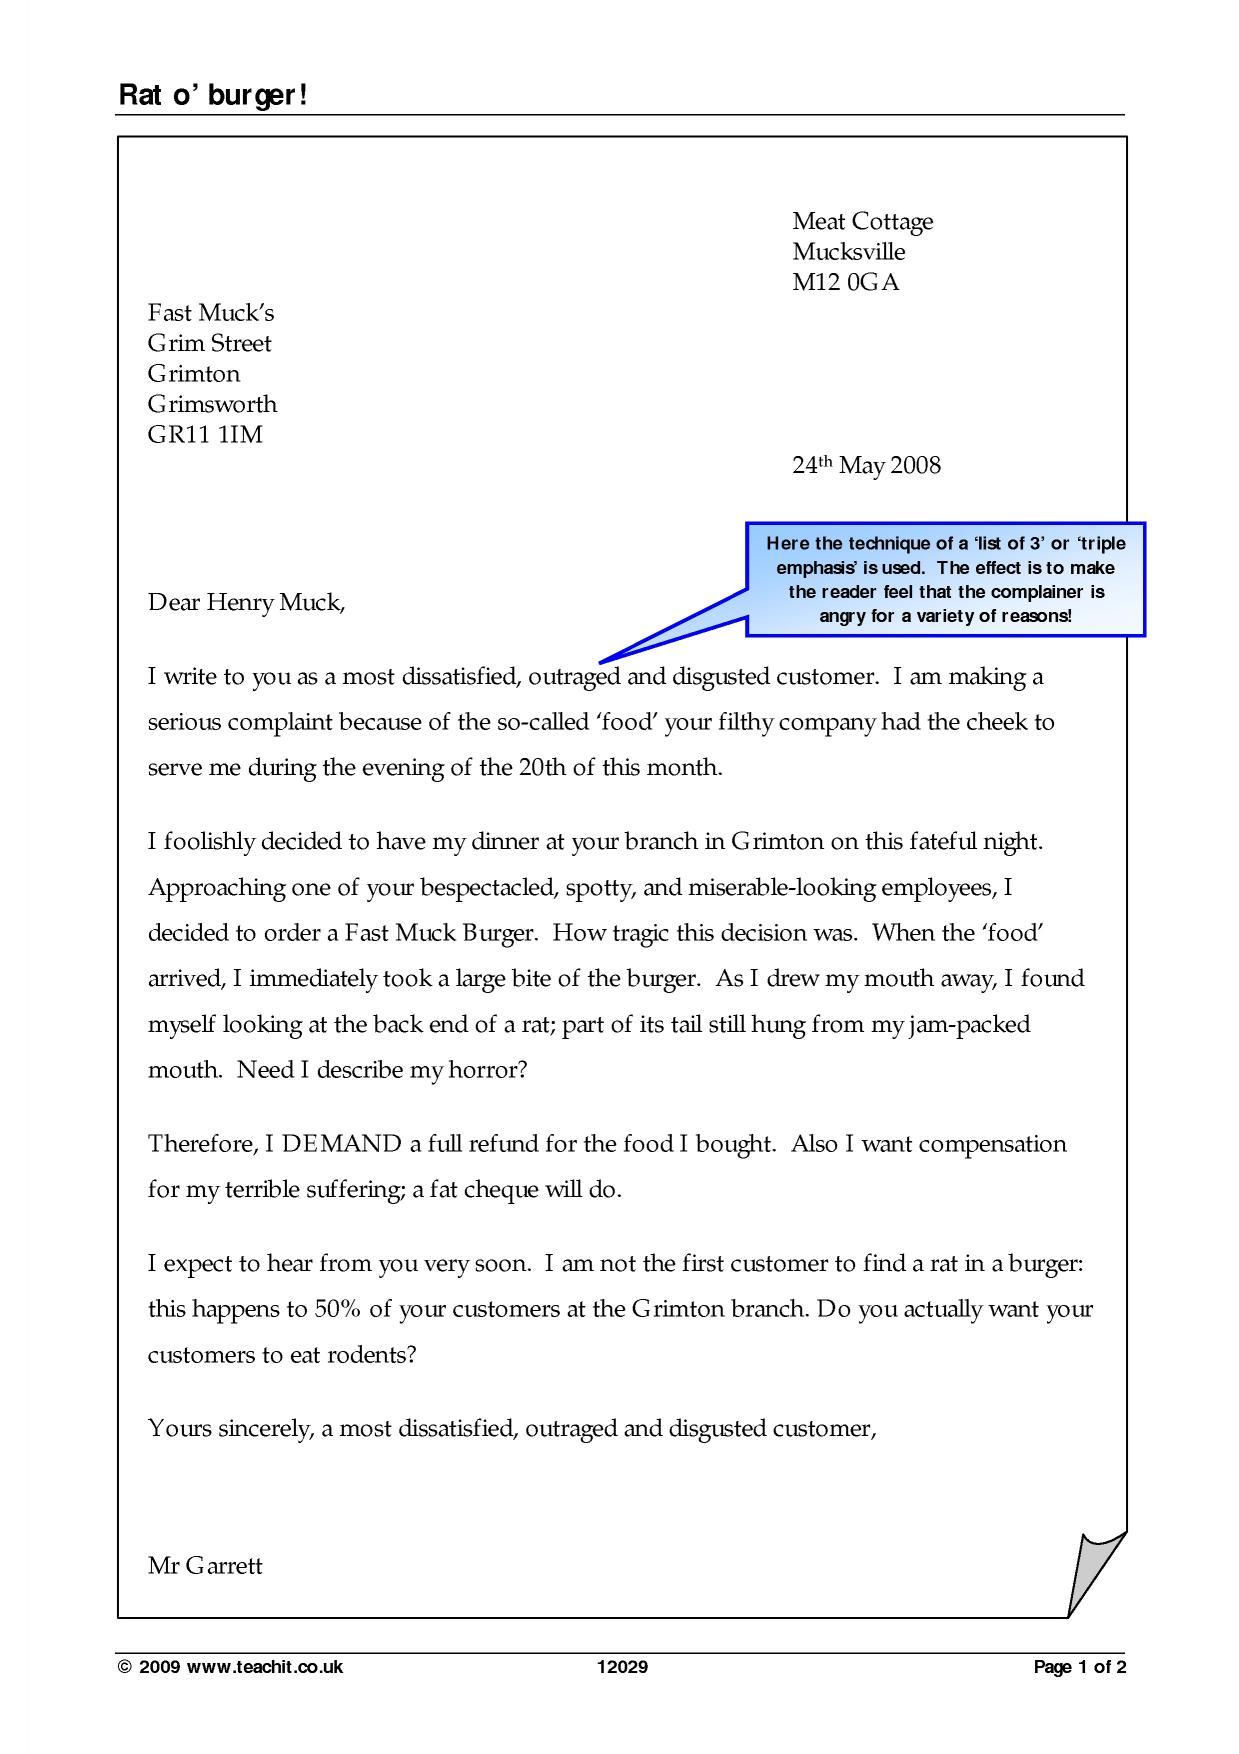 Persuasive Letter Help